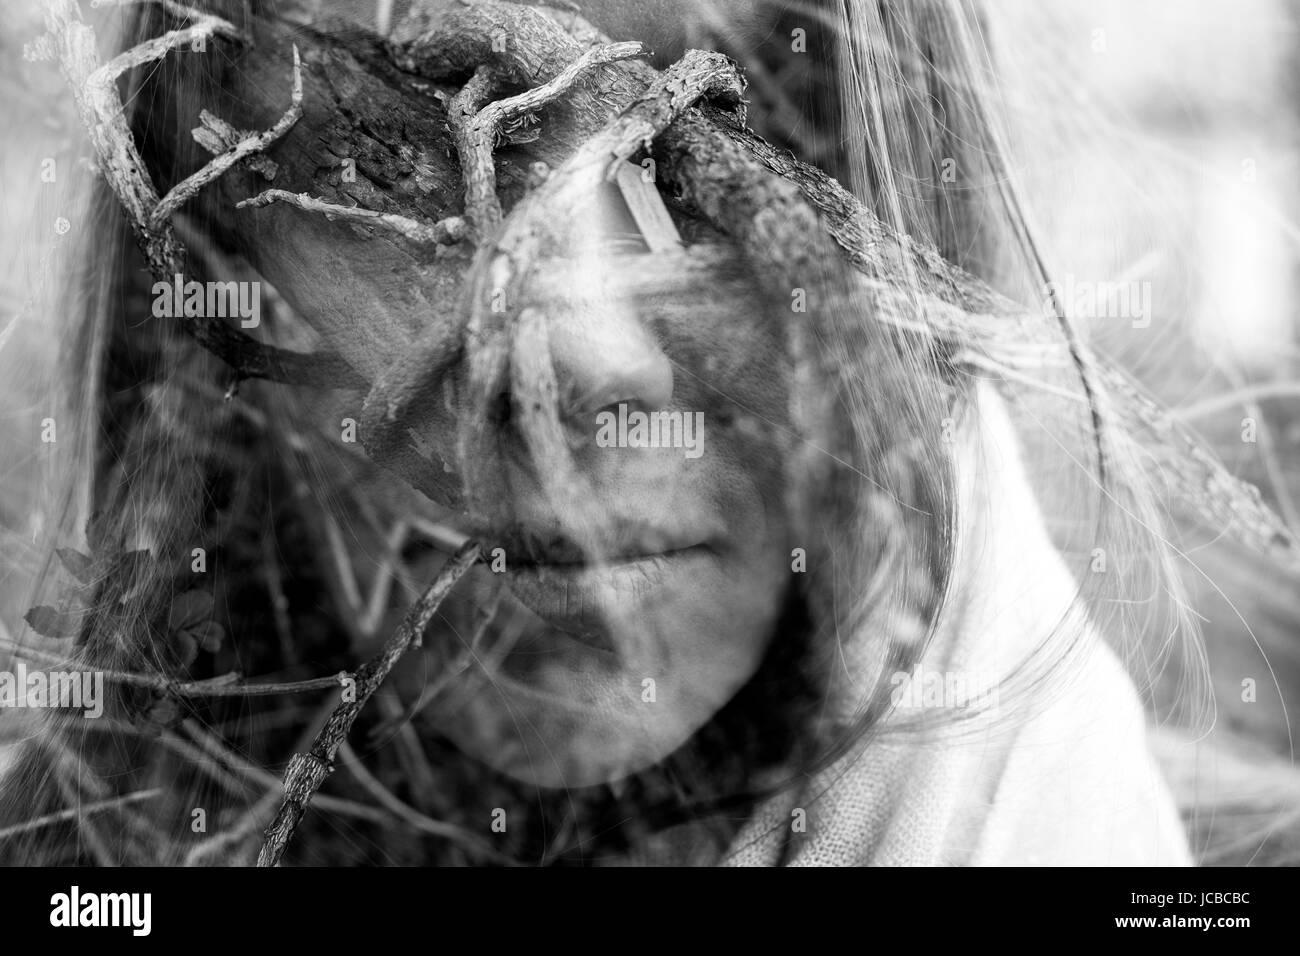 Doble exposición de fotografía creativa mujer triste Imagen De Stock